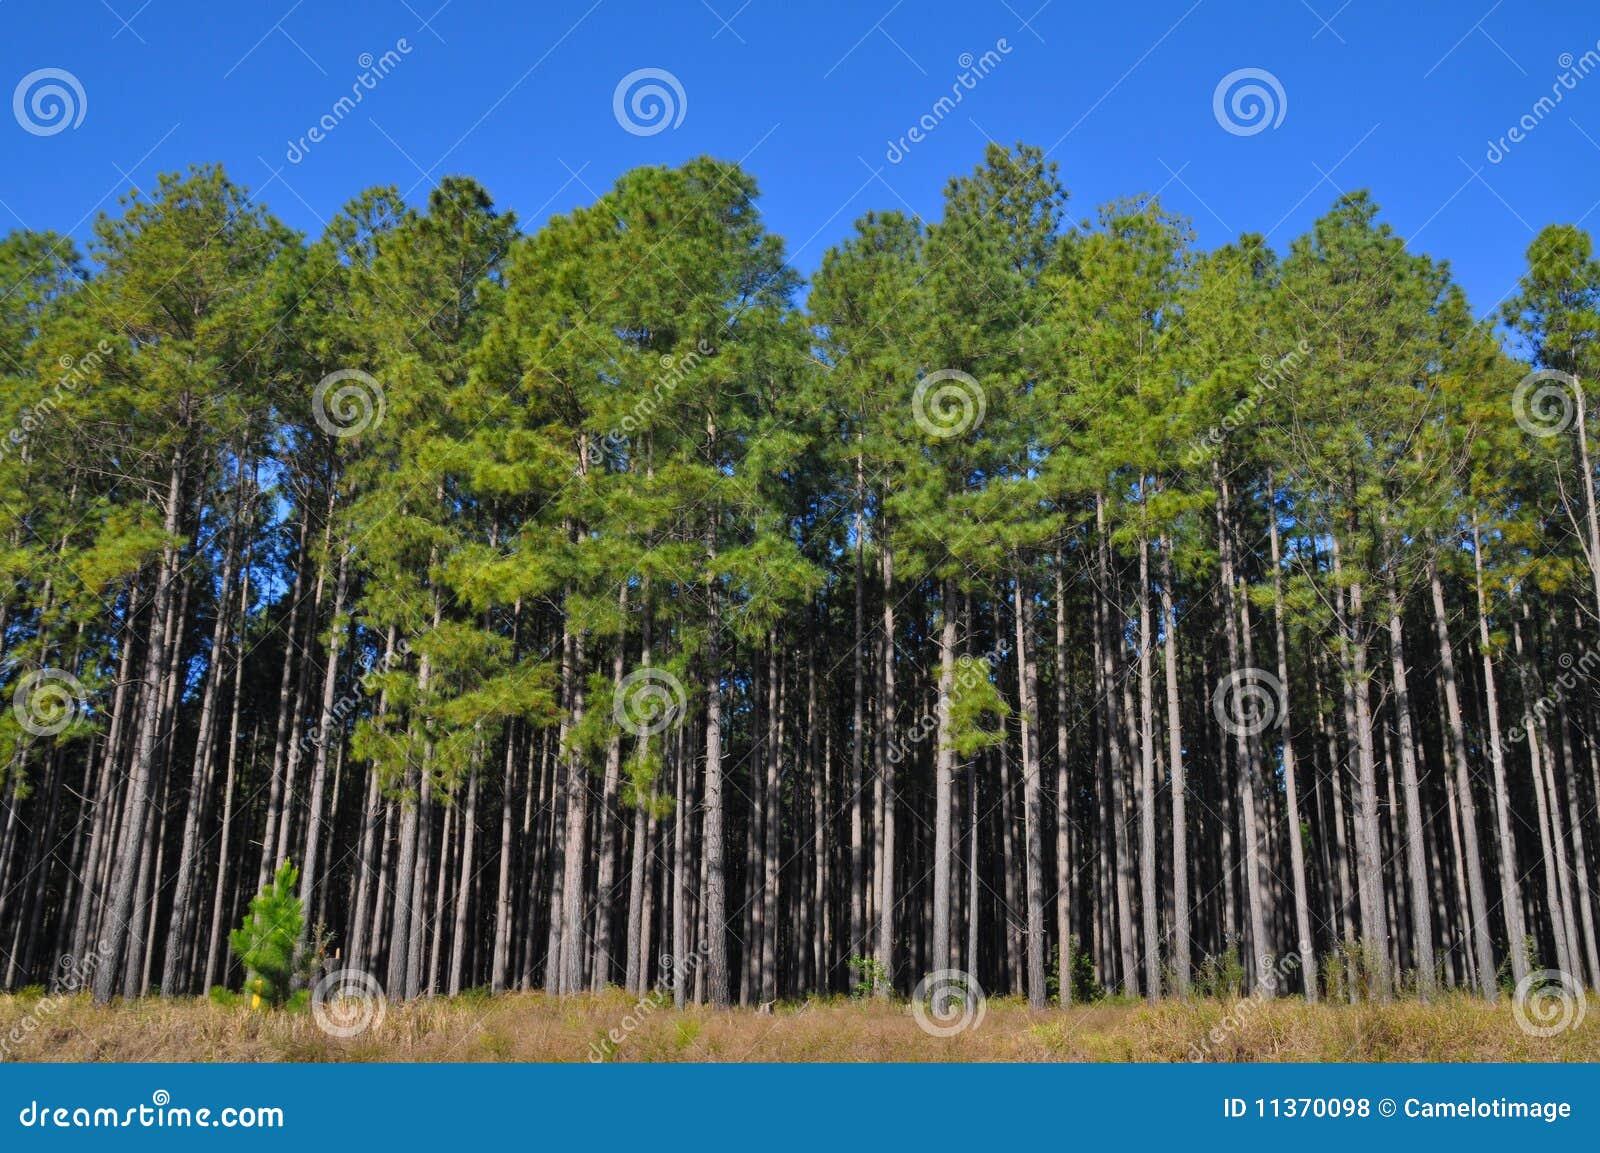 arbres de pin grands au bord d 39 une grande plantation photos libres de droits image 11370098. Black Bedroom Furniture Sets. Home Design Ideas